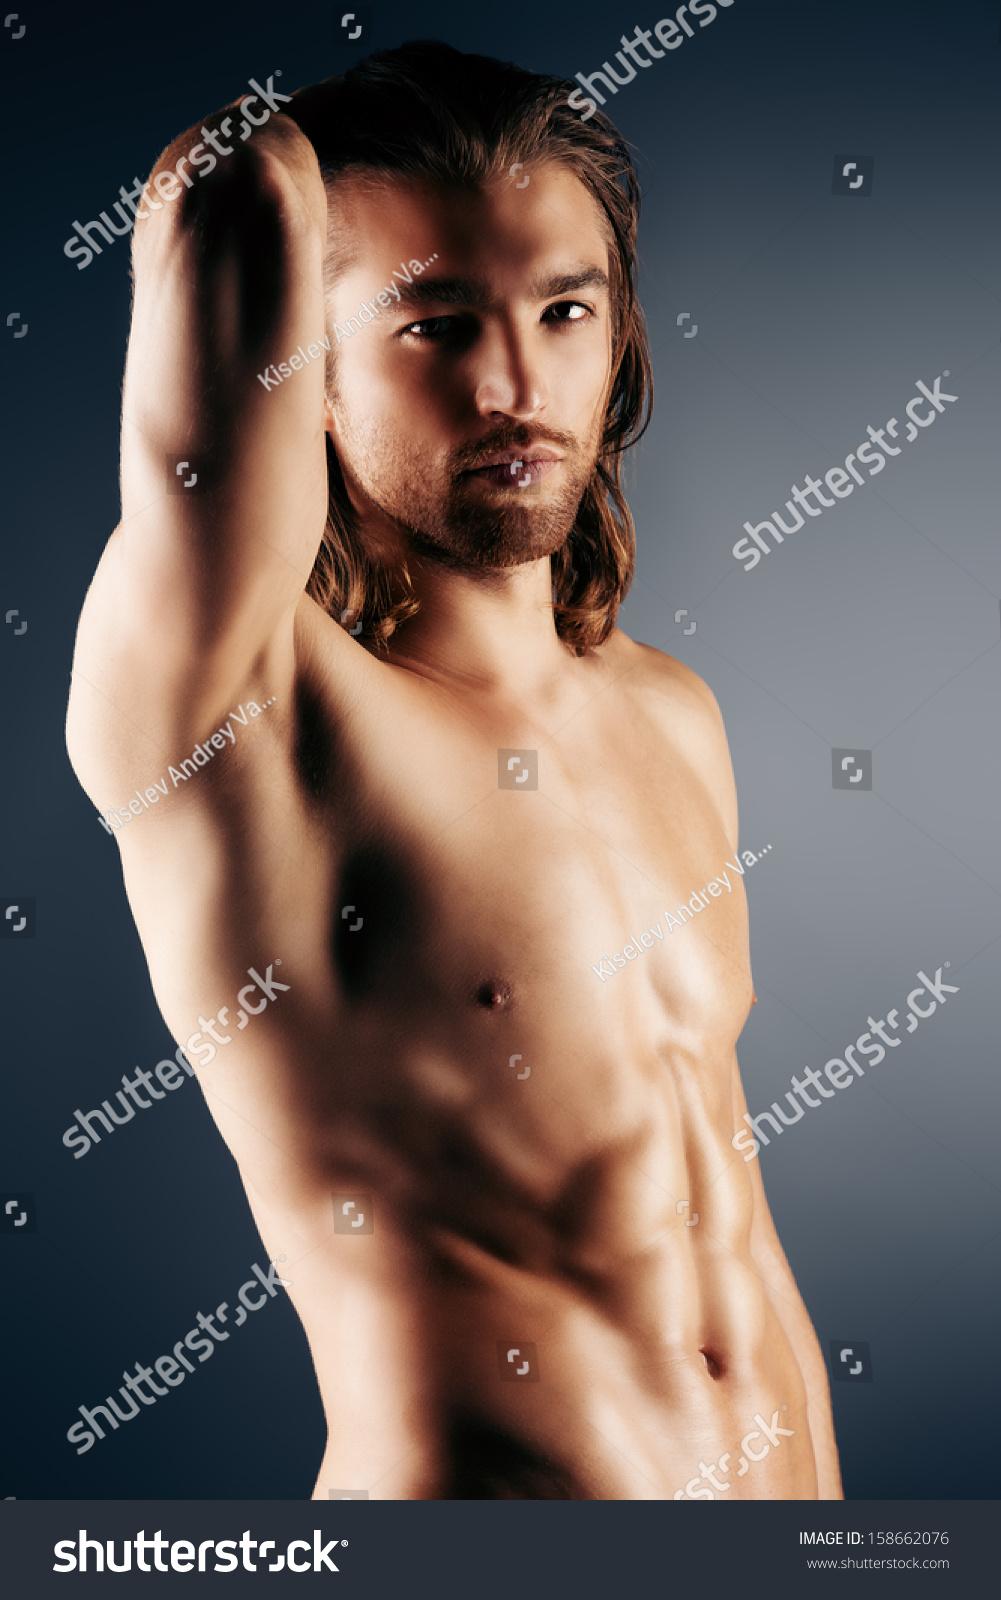 Nude man pics foto 65